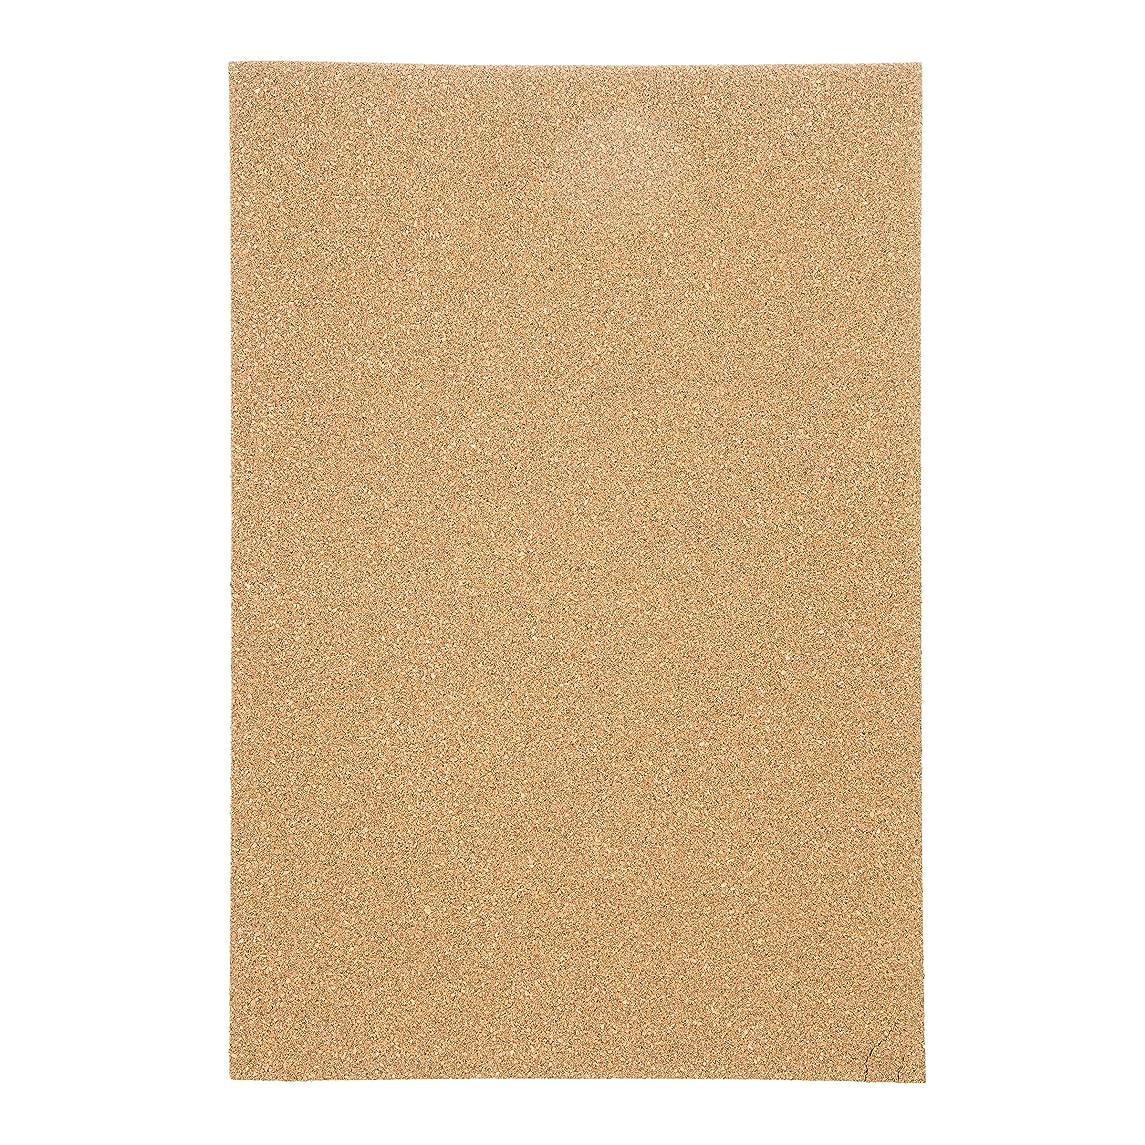 Darice Cork Collection Sheet-12 X18 X.125